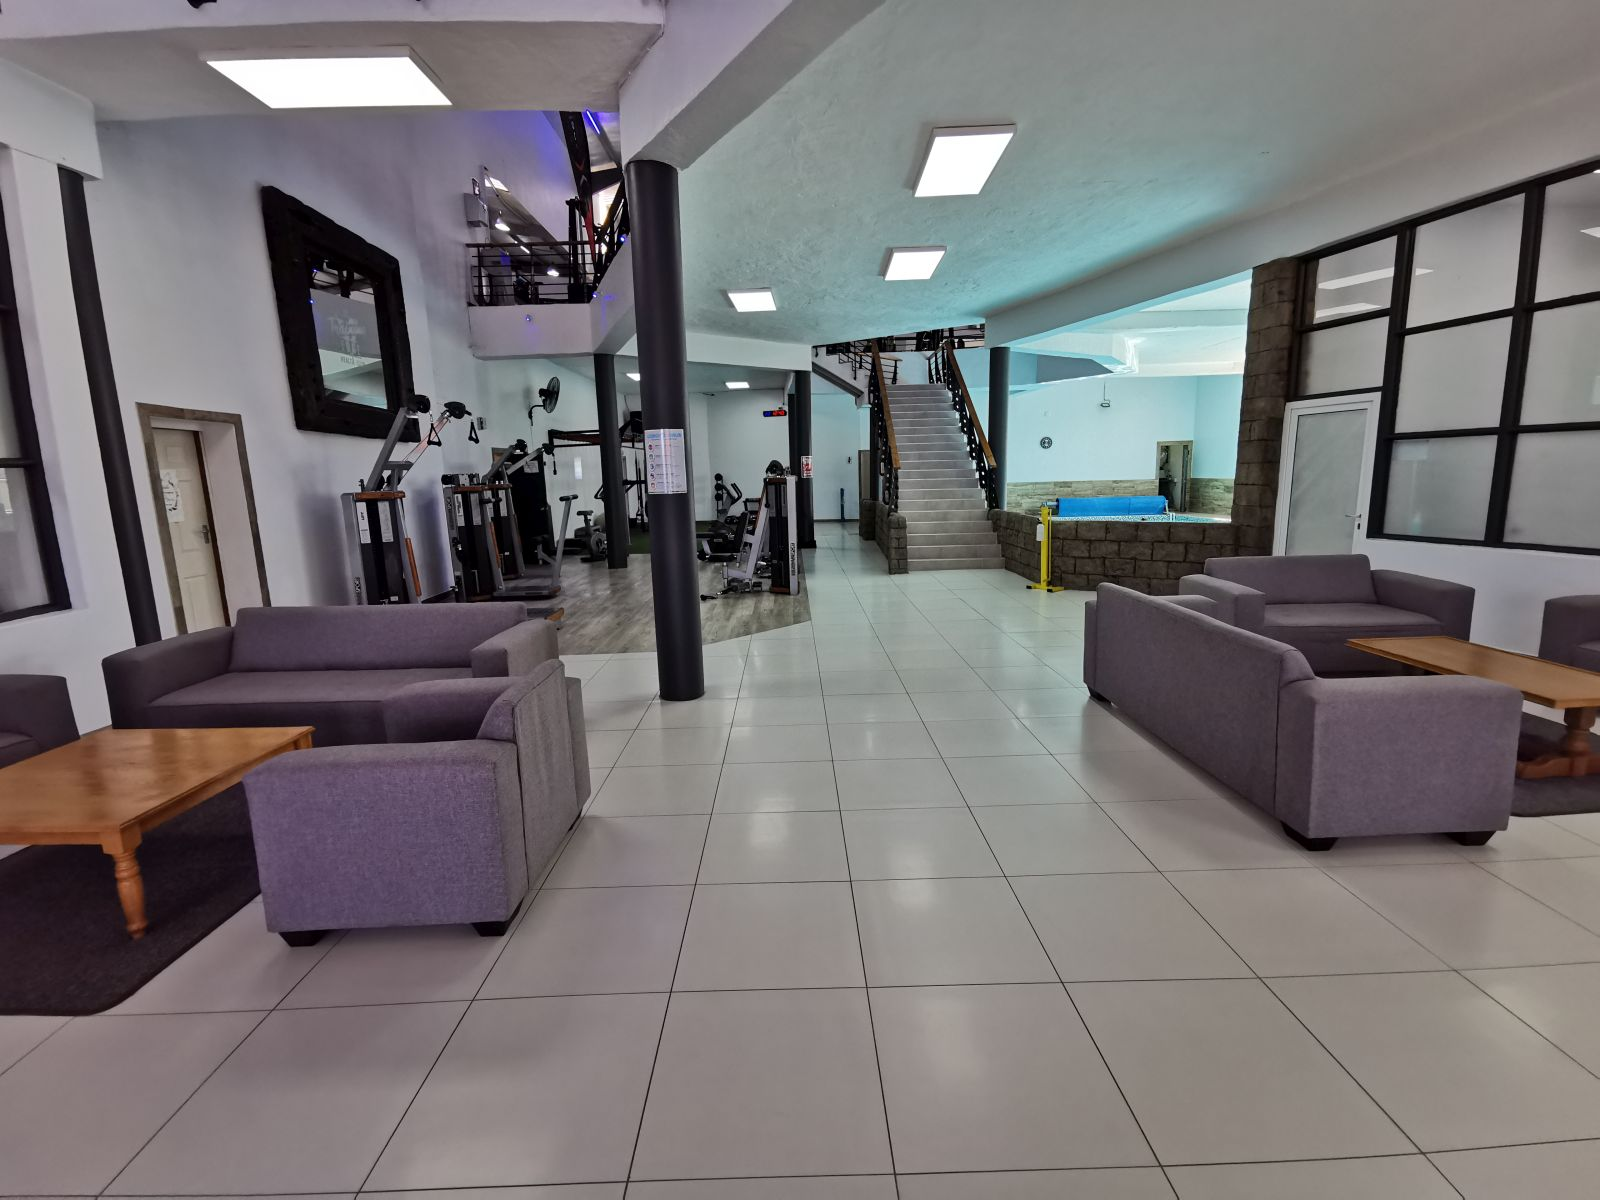 Xclusive Fitness Img 20200828 124050